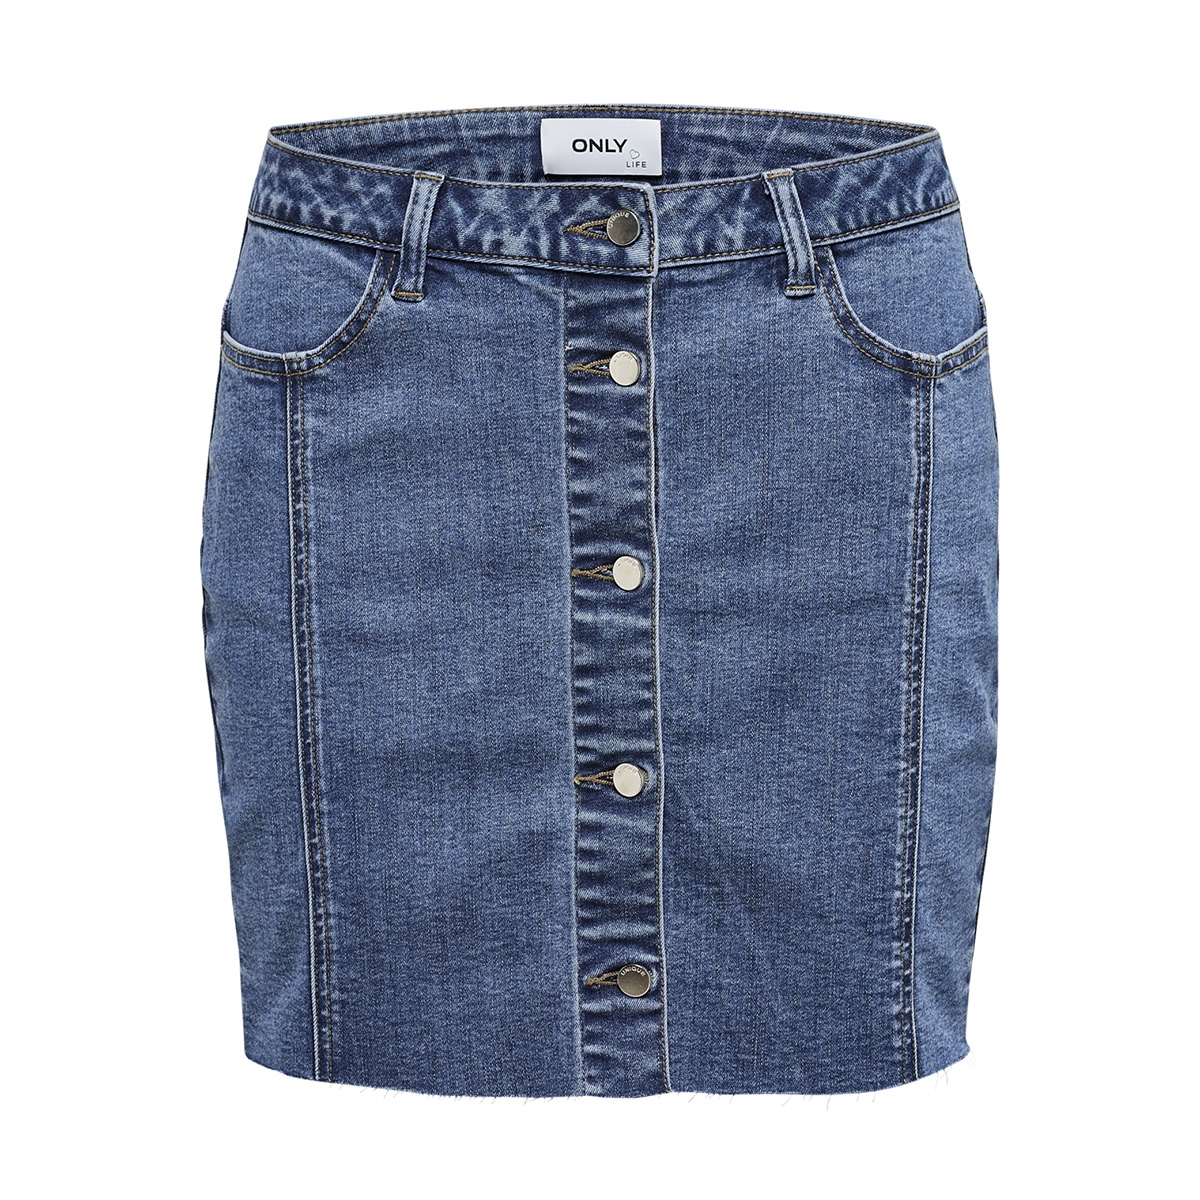 onlfpearl life mw mb cut skirt dnm 15175354 only rok medium blue denim